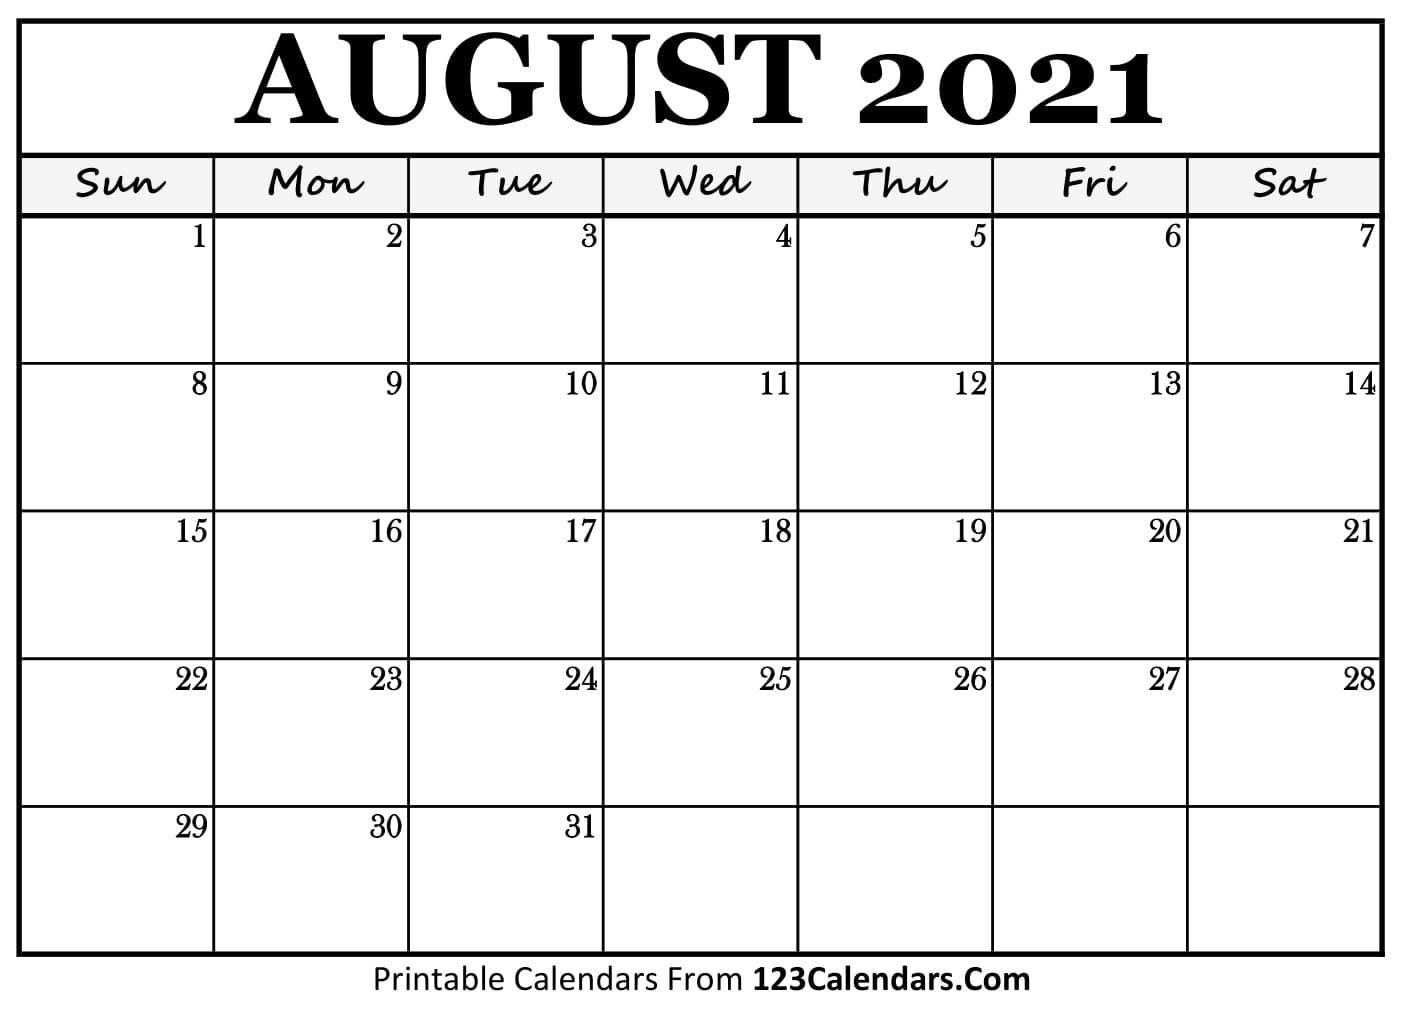 Printable August 2021 Calendar Templates   123Calendars August 2021 Calendar Images